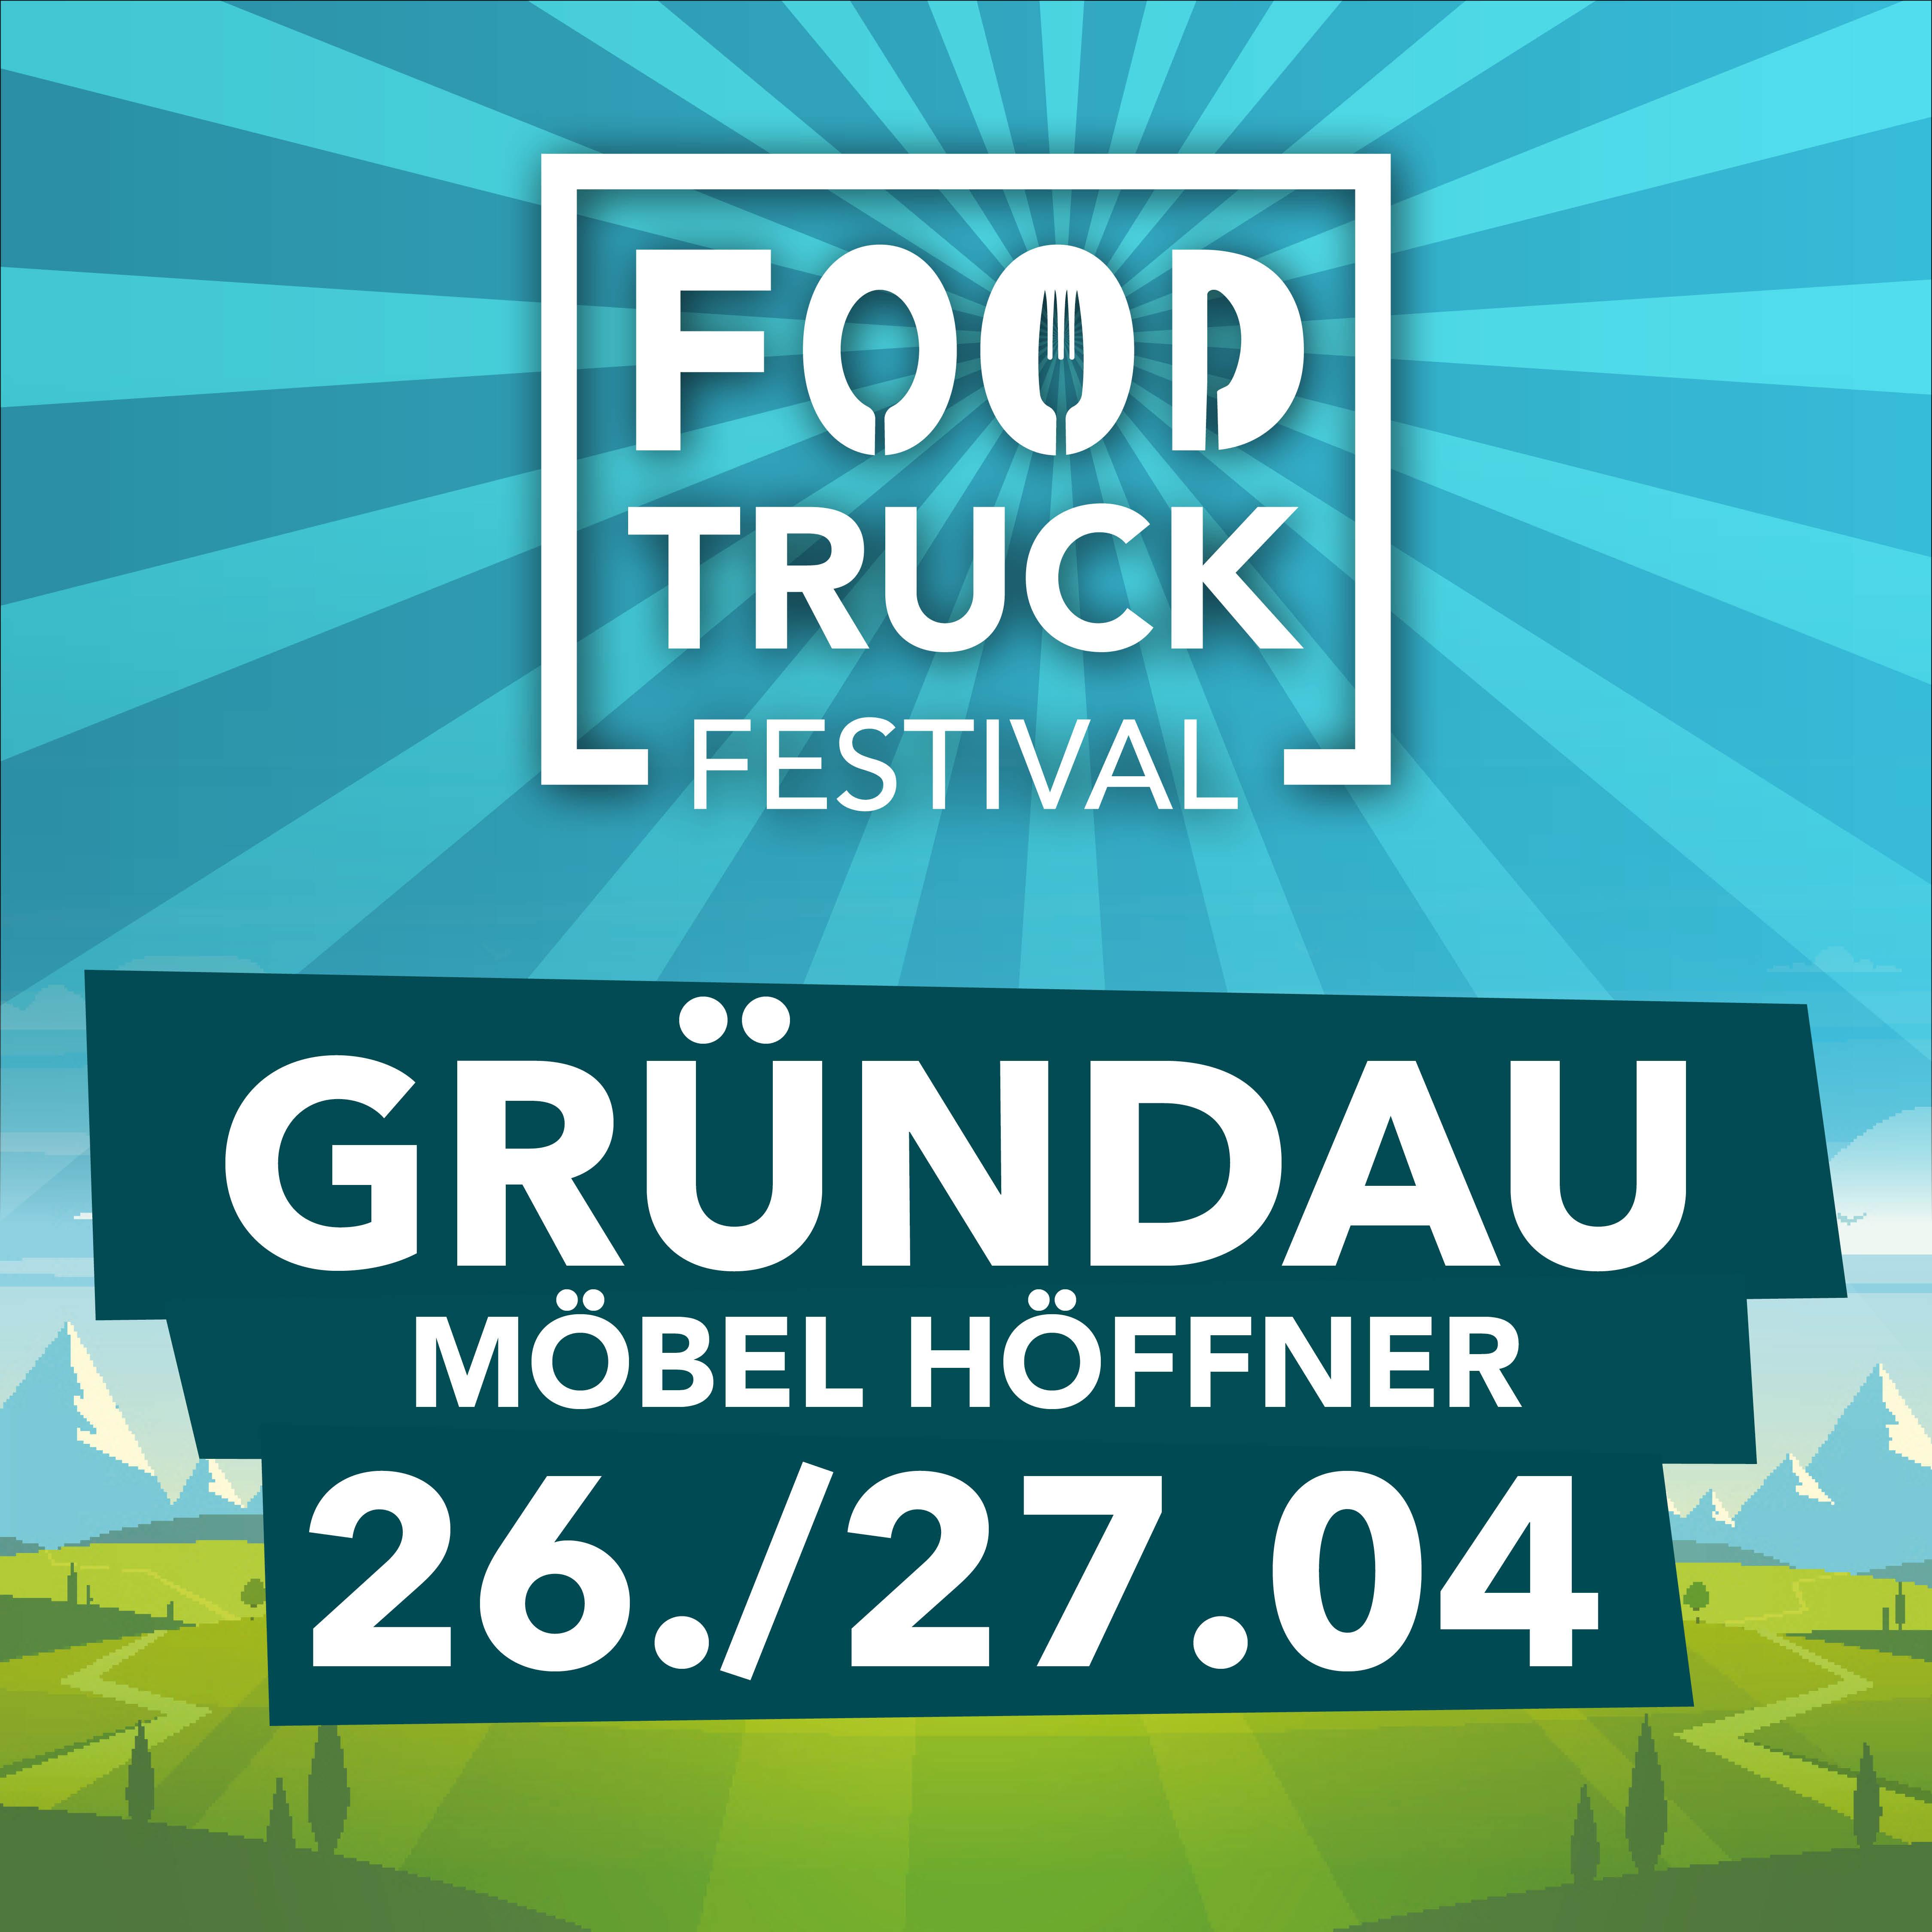 Foodtruck Festival Gründau 2019 Foodtruck Festivals